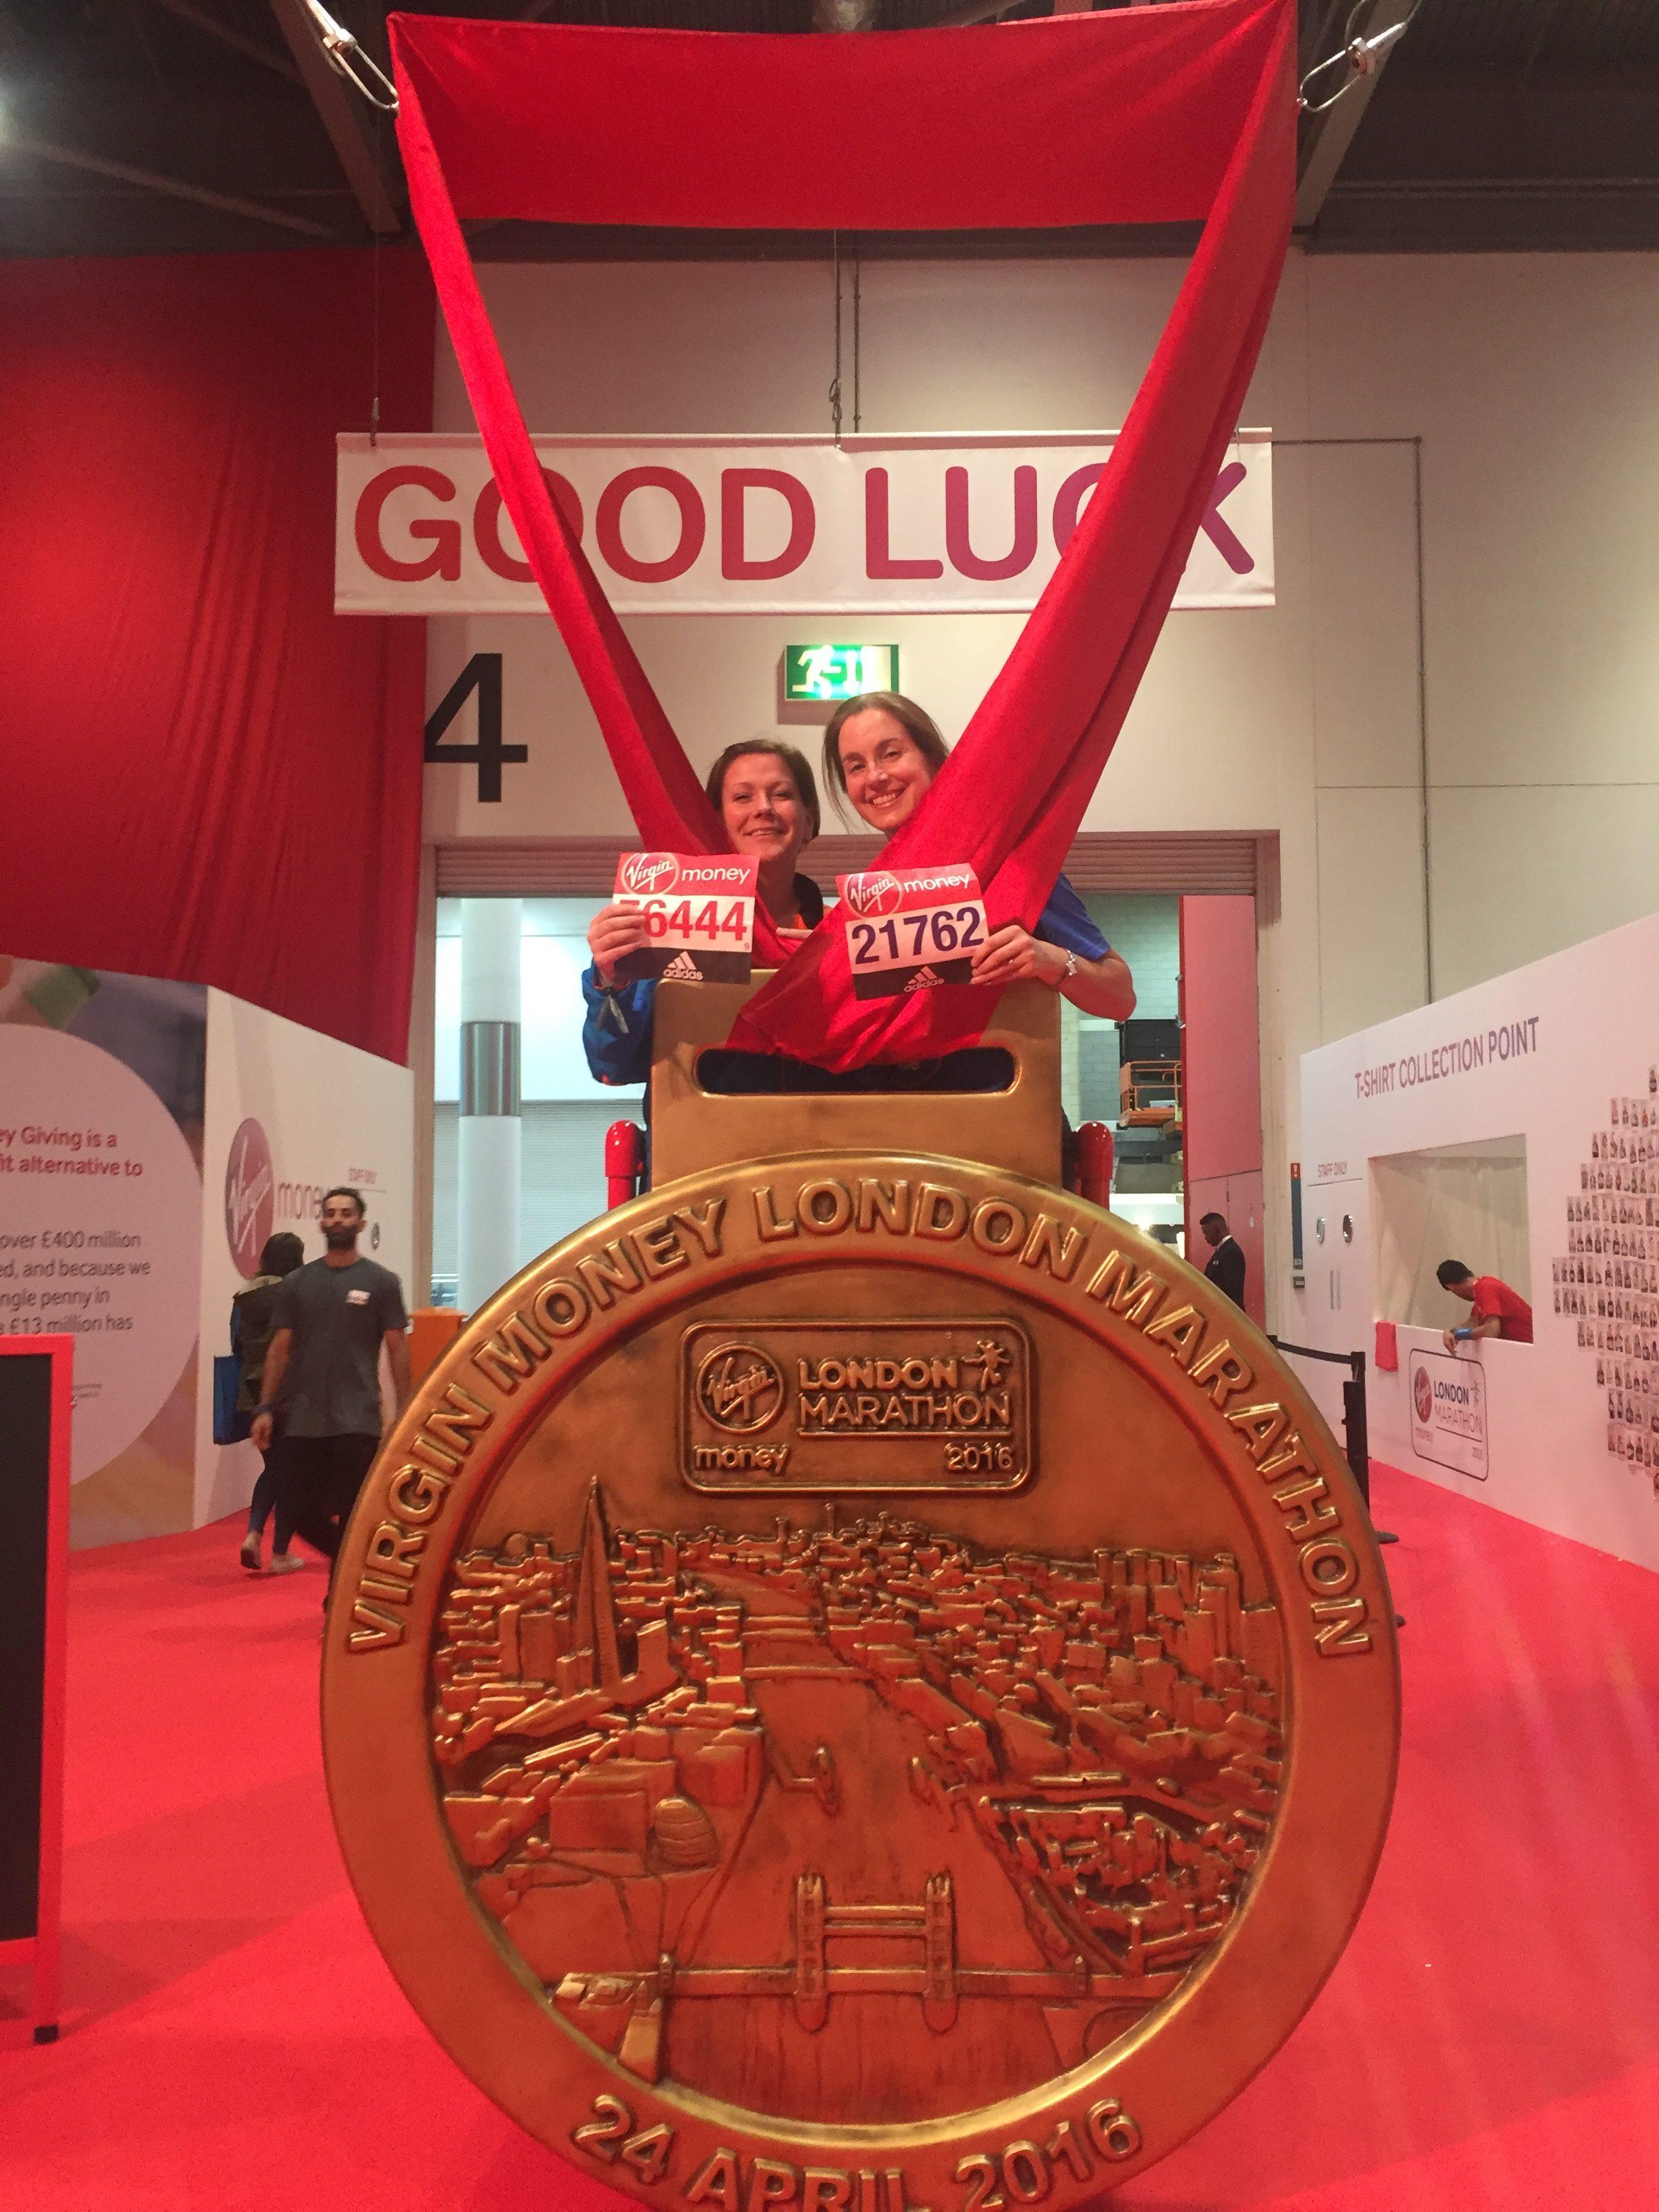 London Marathon Expo 2016